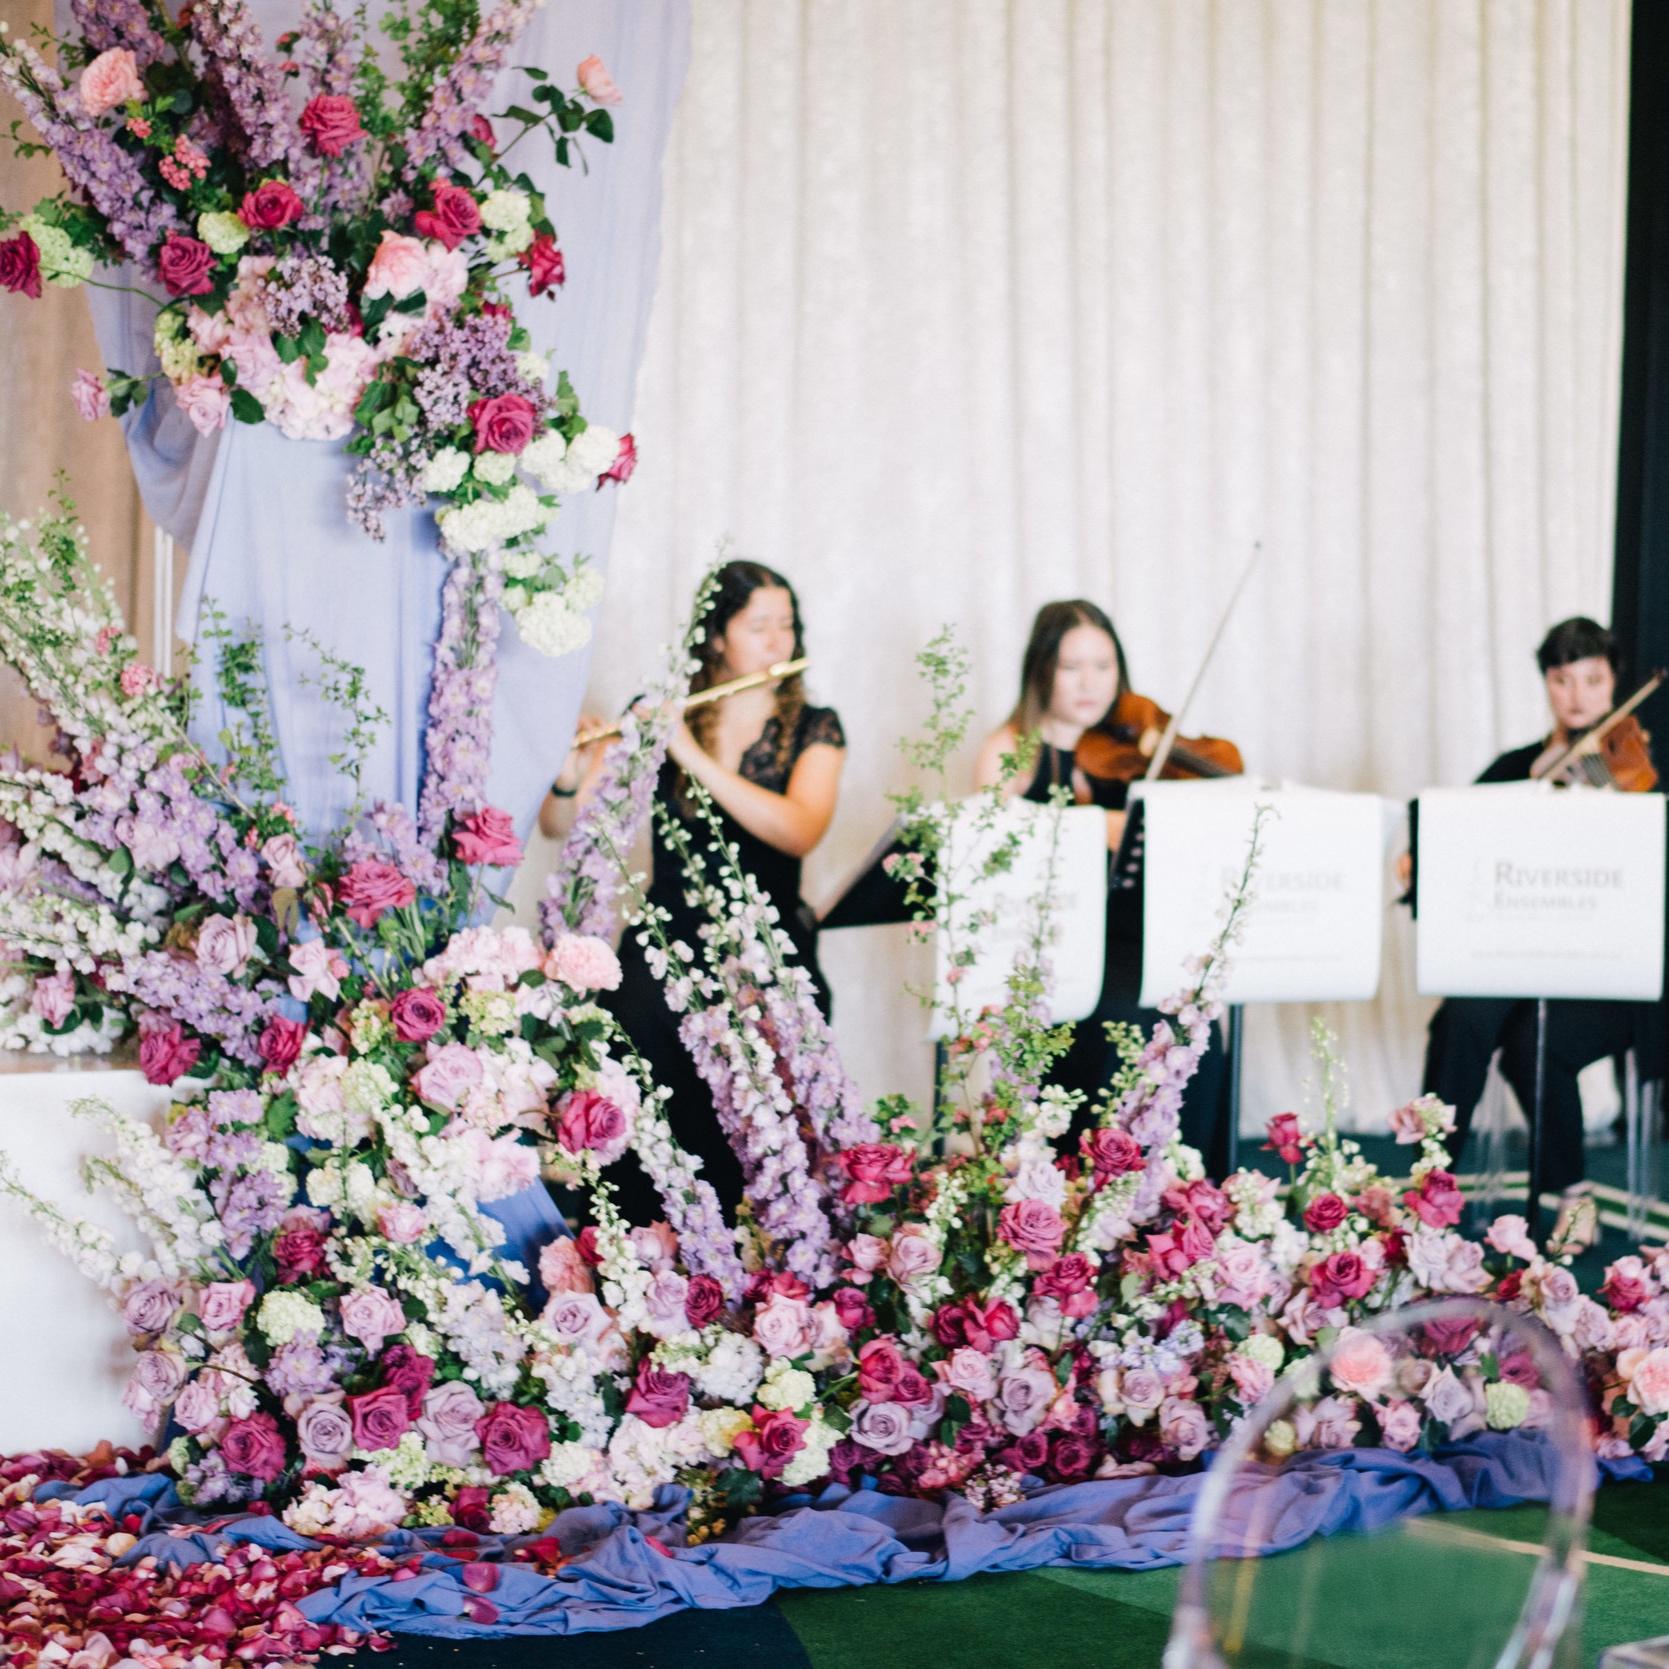 perth-function-string-music-hire-wedding-riverside-musiciansperth-function-string-music-hire-wedding-riverside-musicians-classical-contemporary-flute-quartet-violinist-cellist